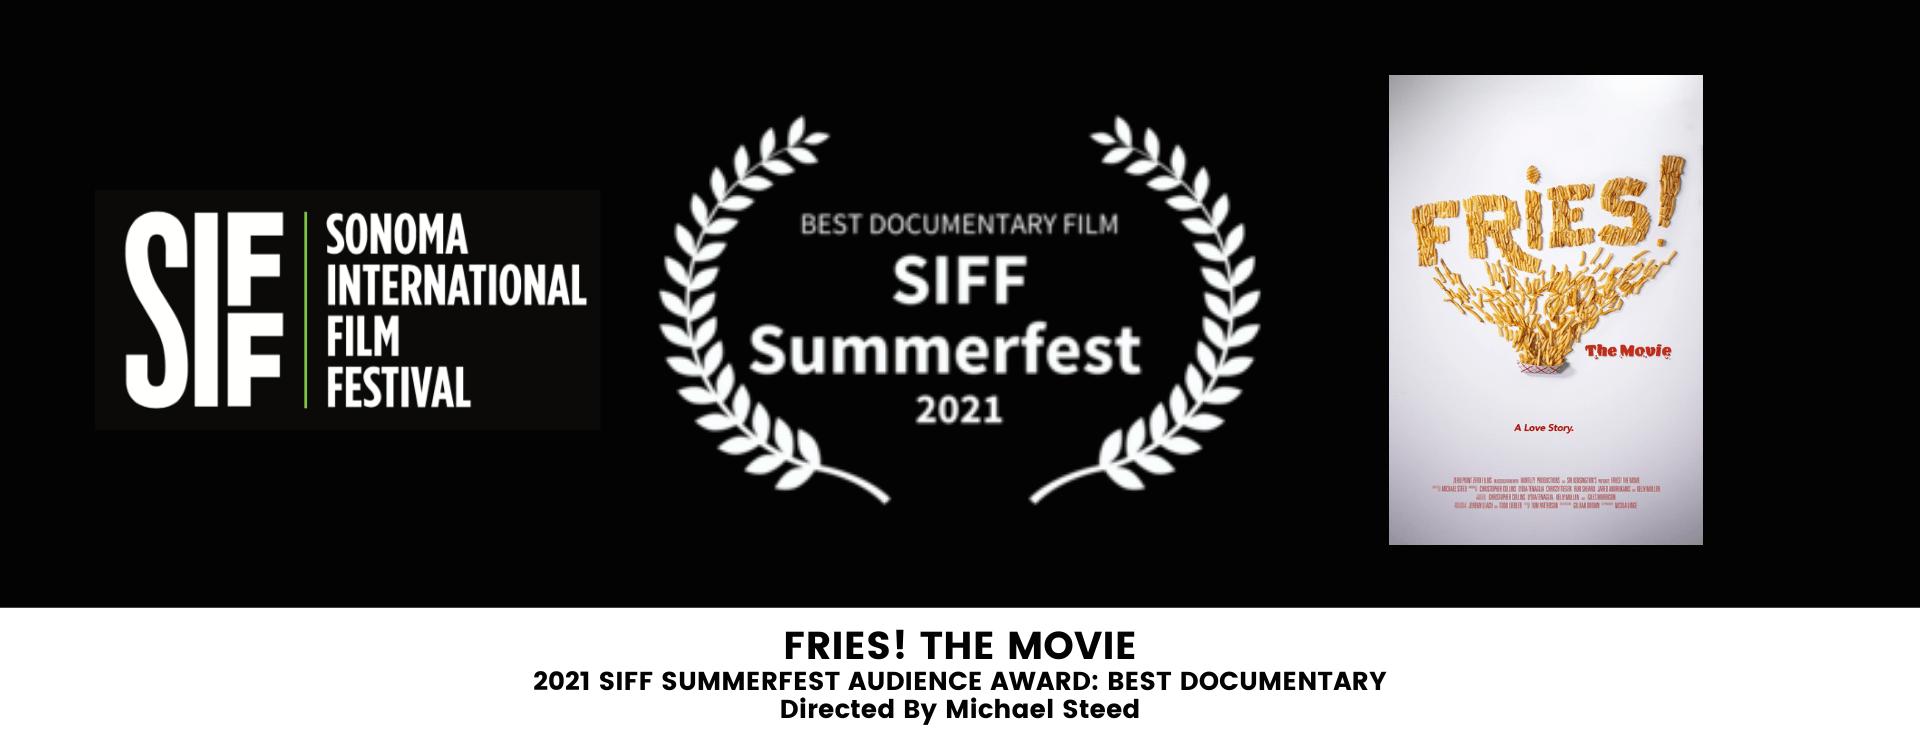 Best Documentary Film SIFF Summerfest 2021